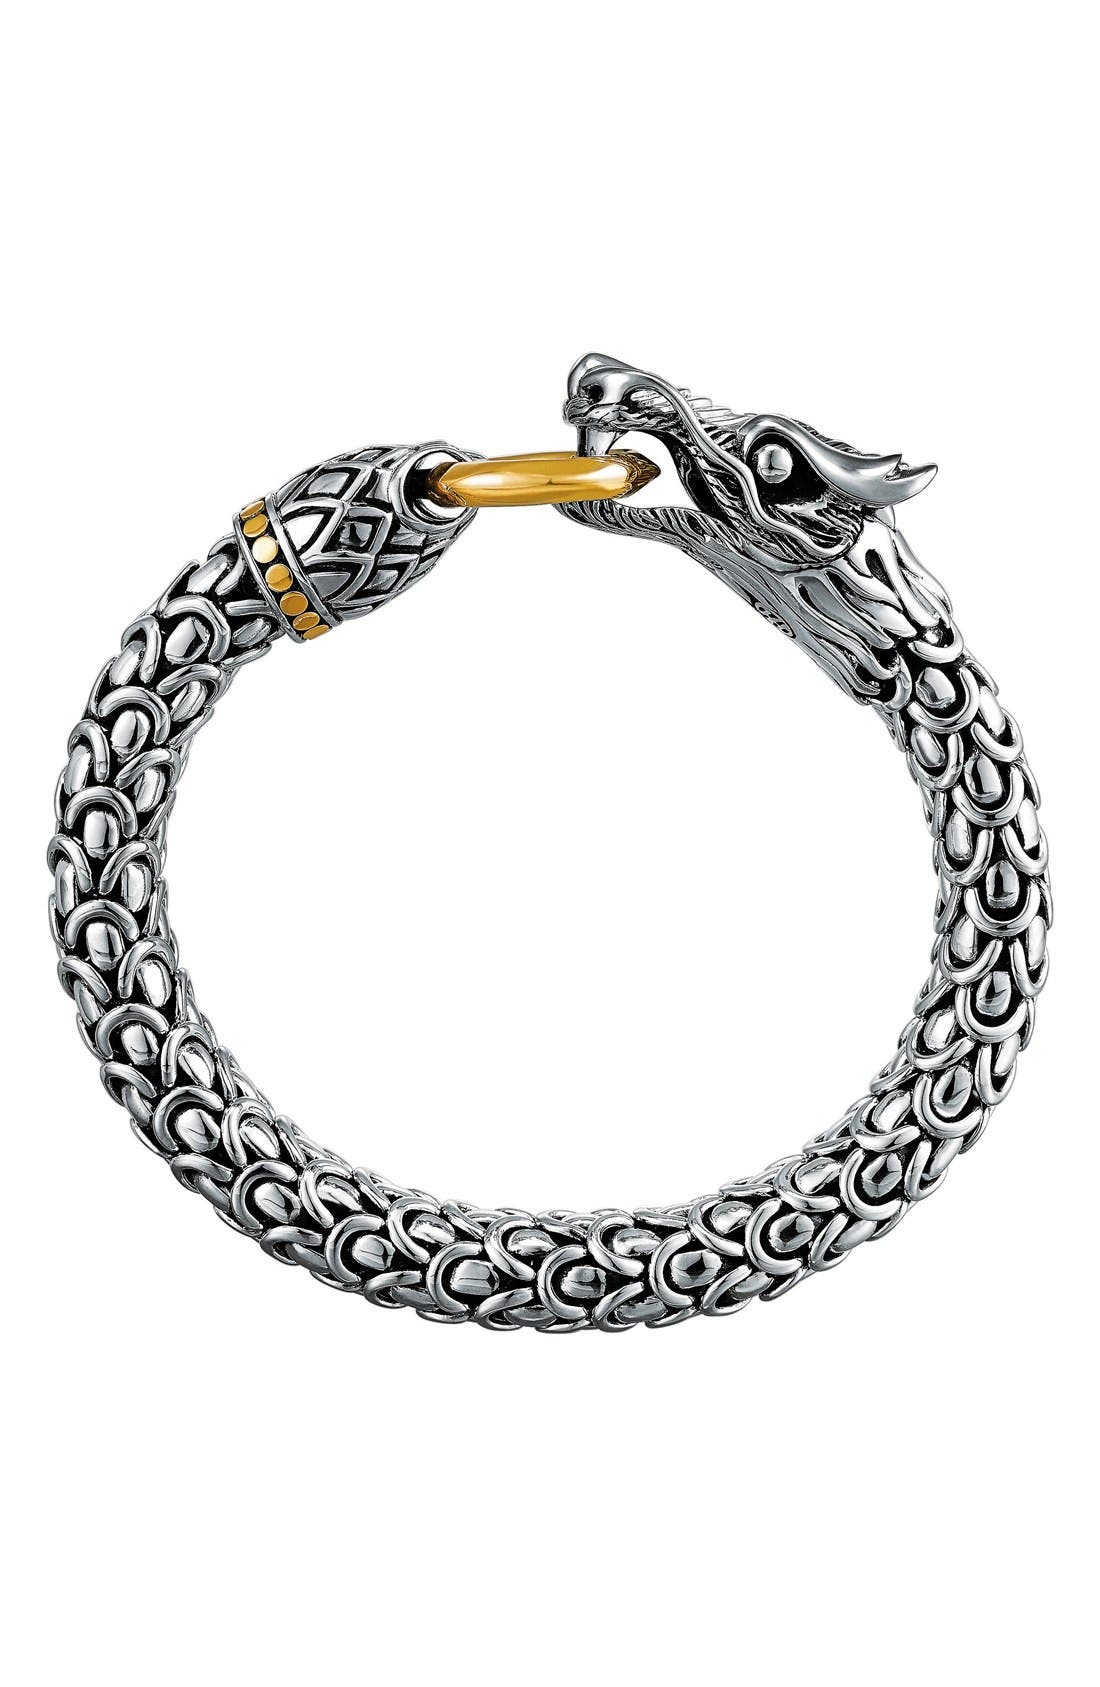 'Naga' Dragon Bracelet,                         Main,                         color, Silver/ Gold